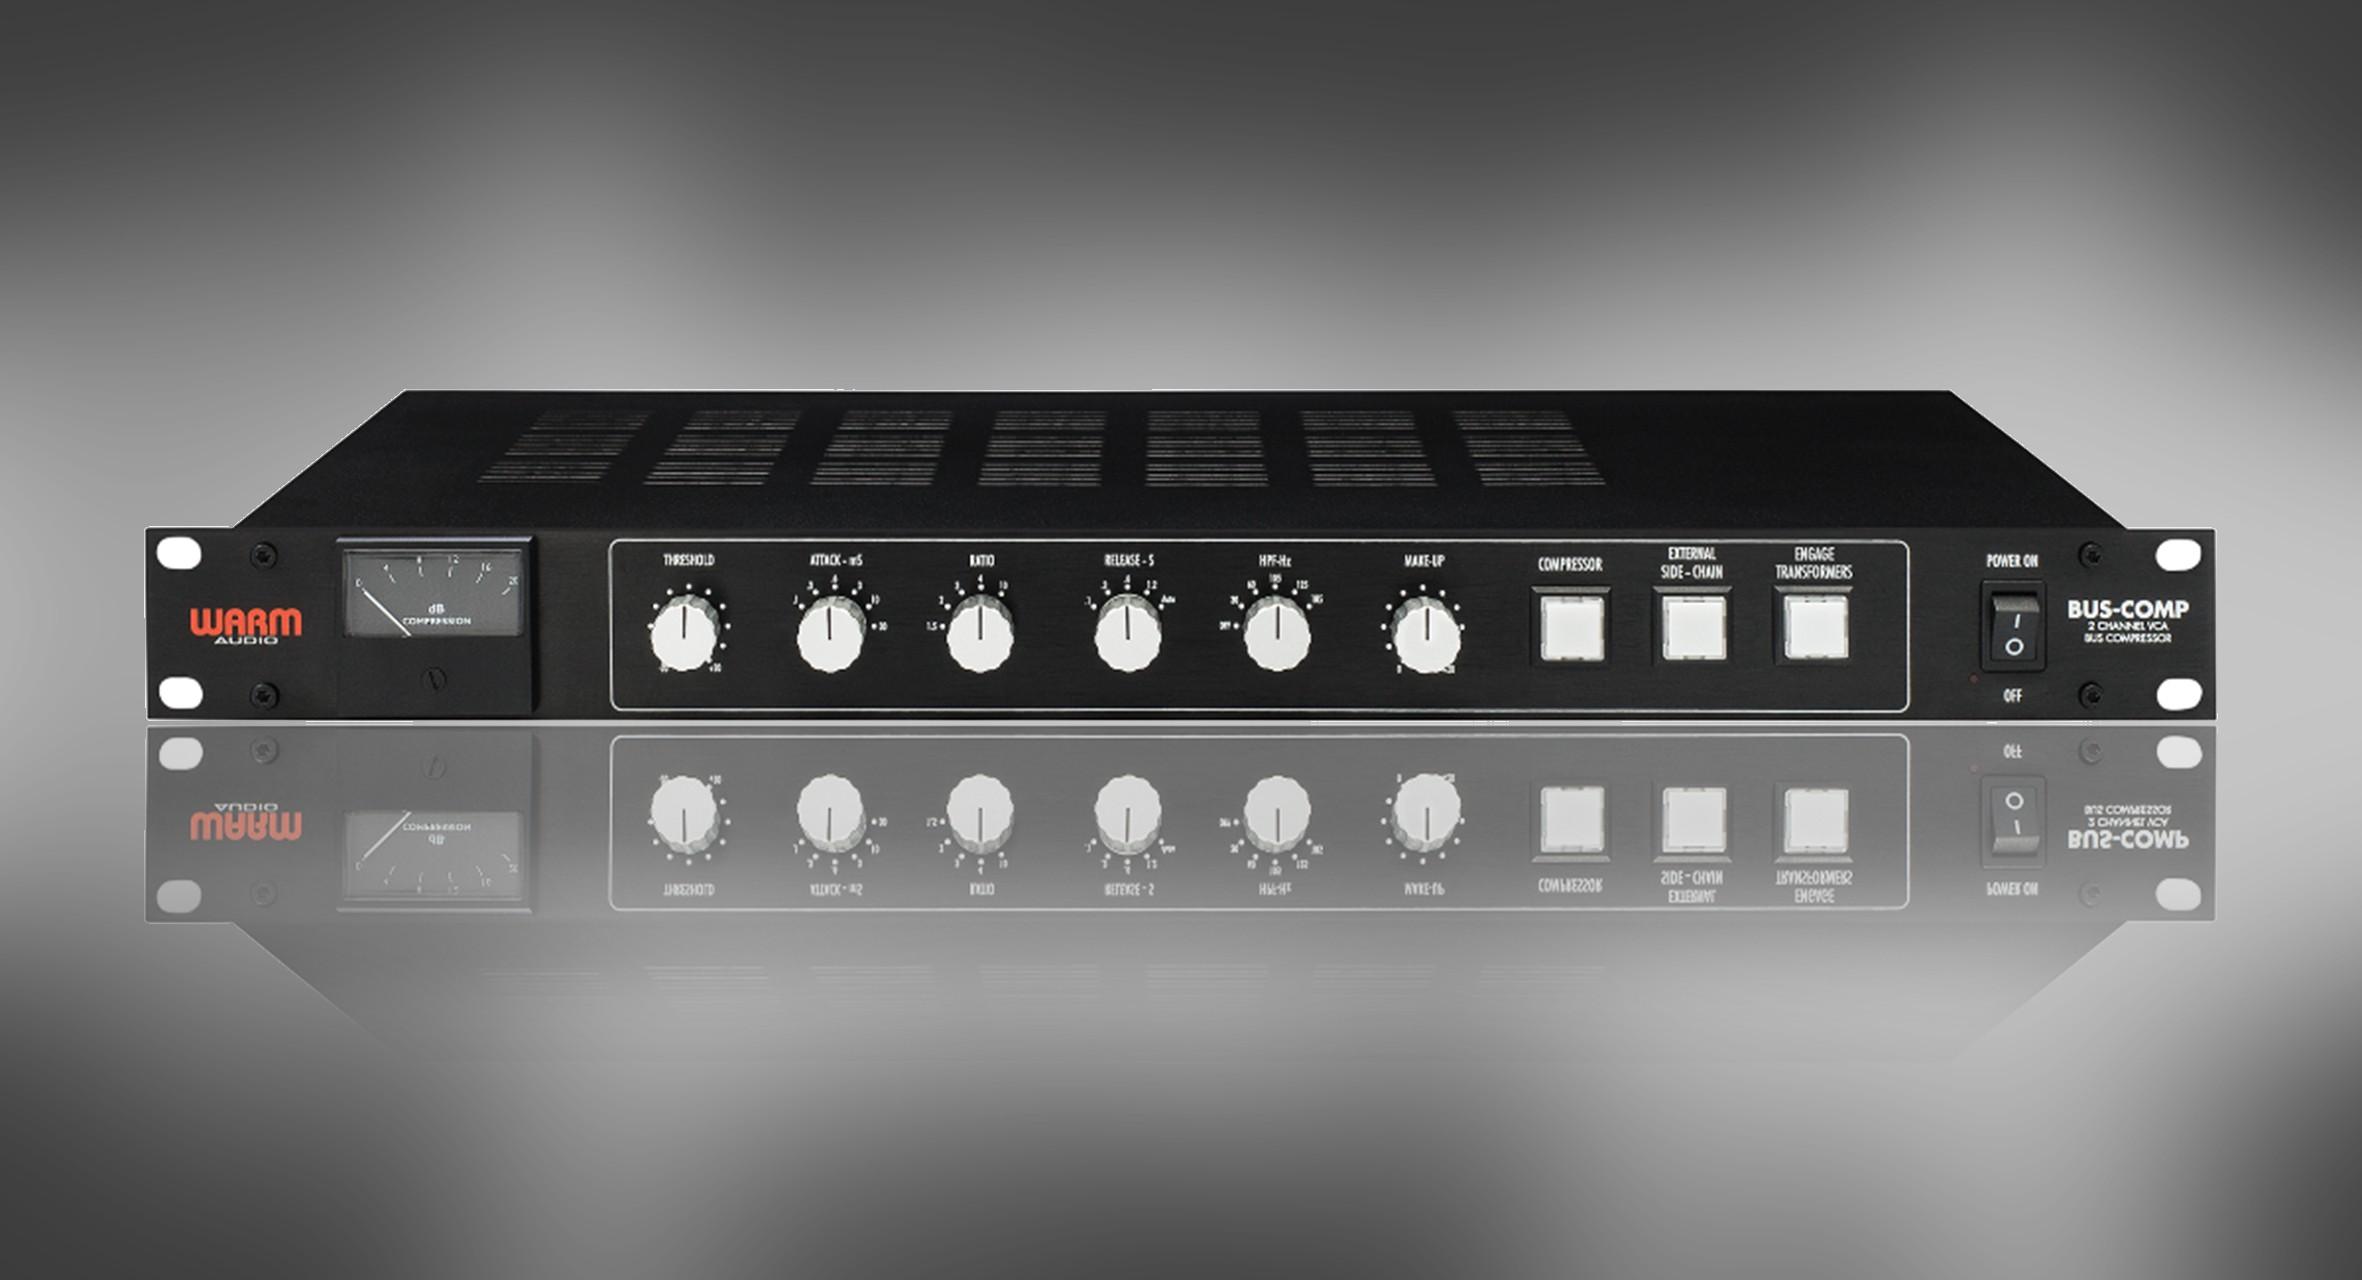 Warm Audio官方演示:新产品BUS-COMP介绍及操作